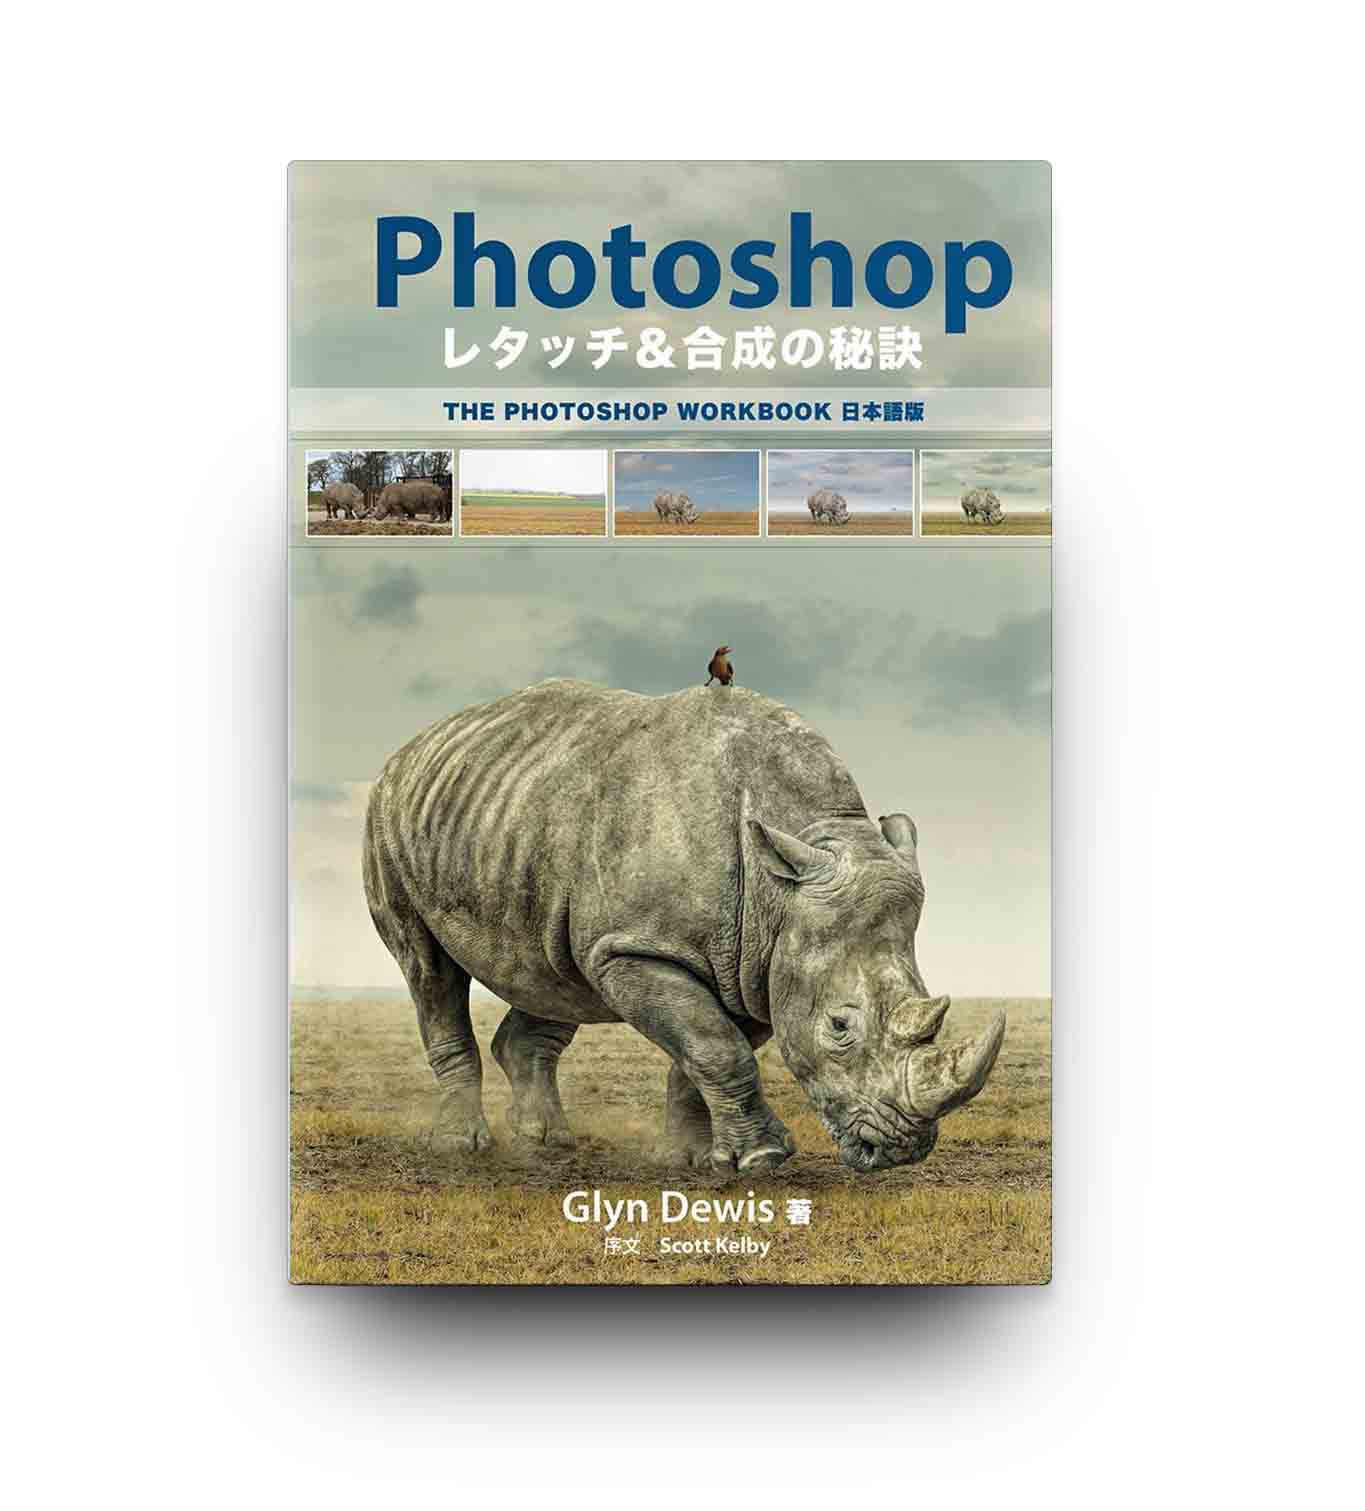 photoshop レタッチ合成の秘訣